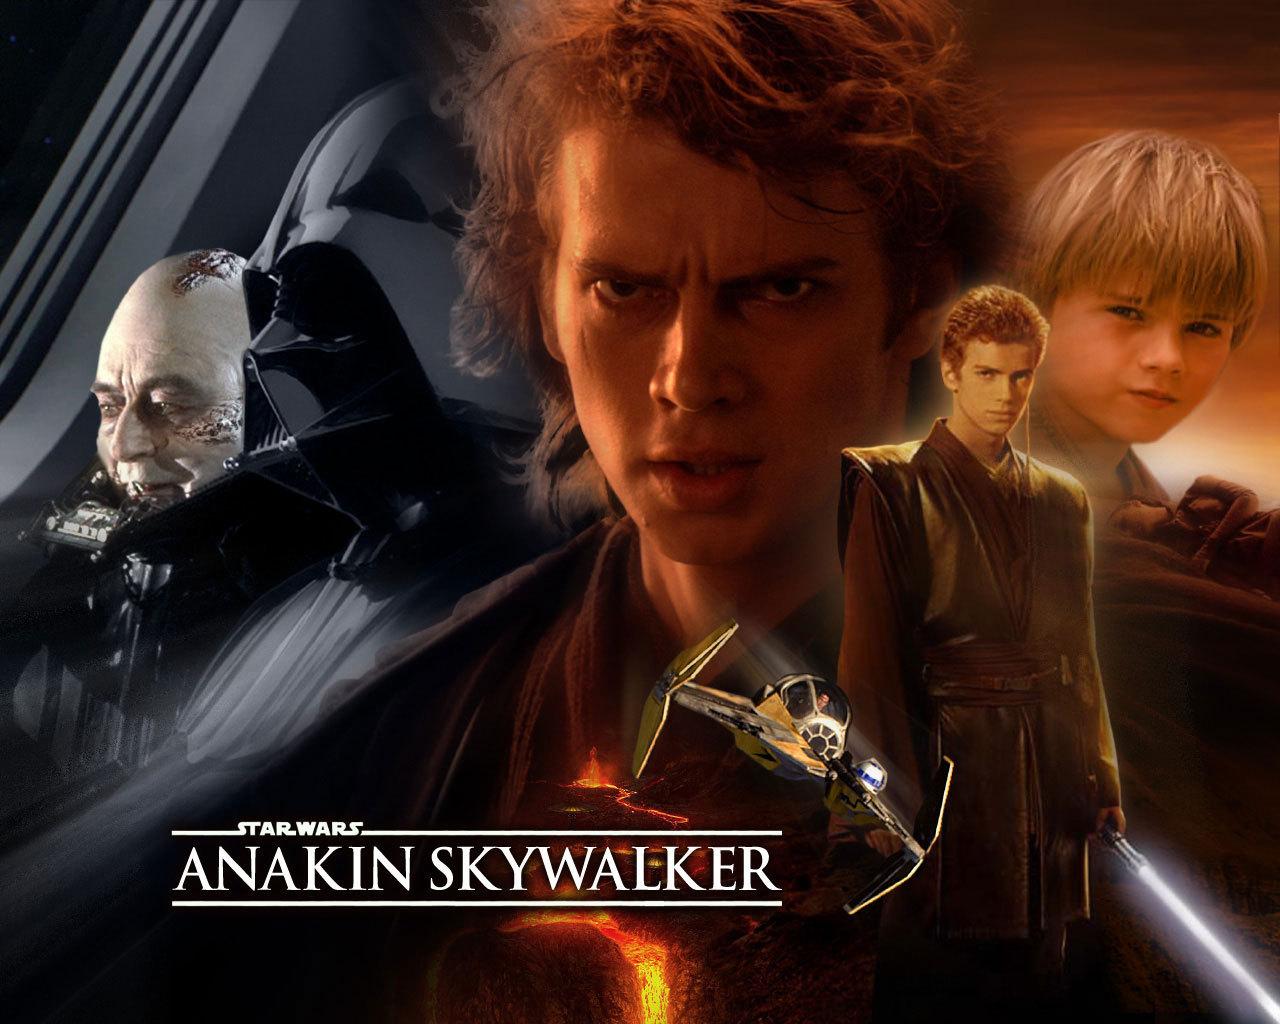 Star Wars Episode 1 Obi Wan Jeu PC   Images vidos astuces et 1280x1024